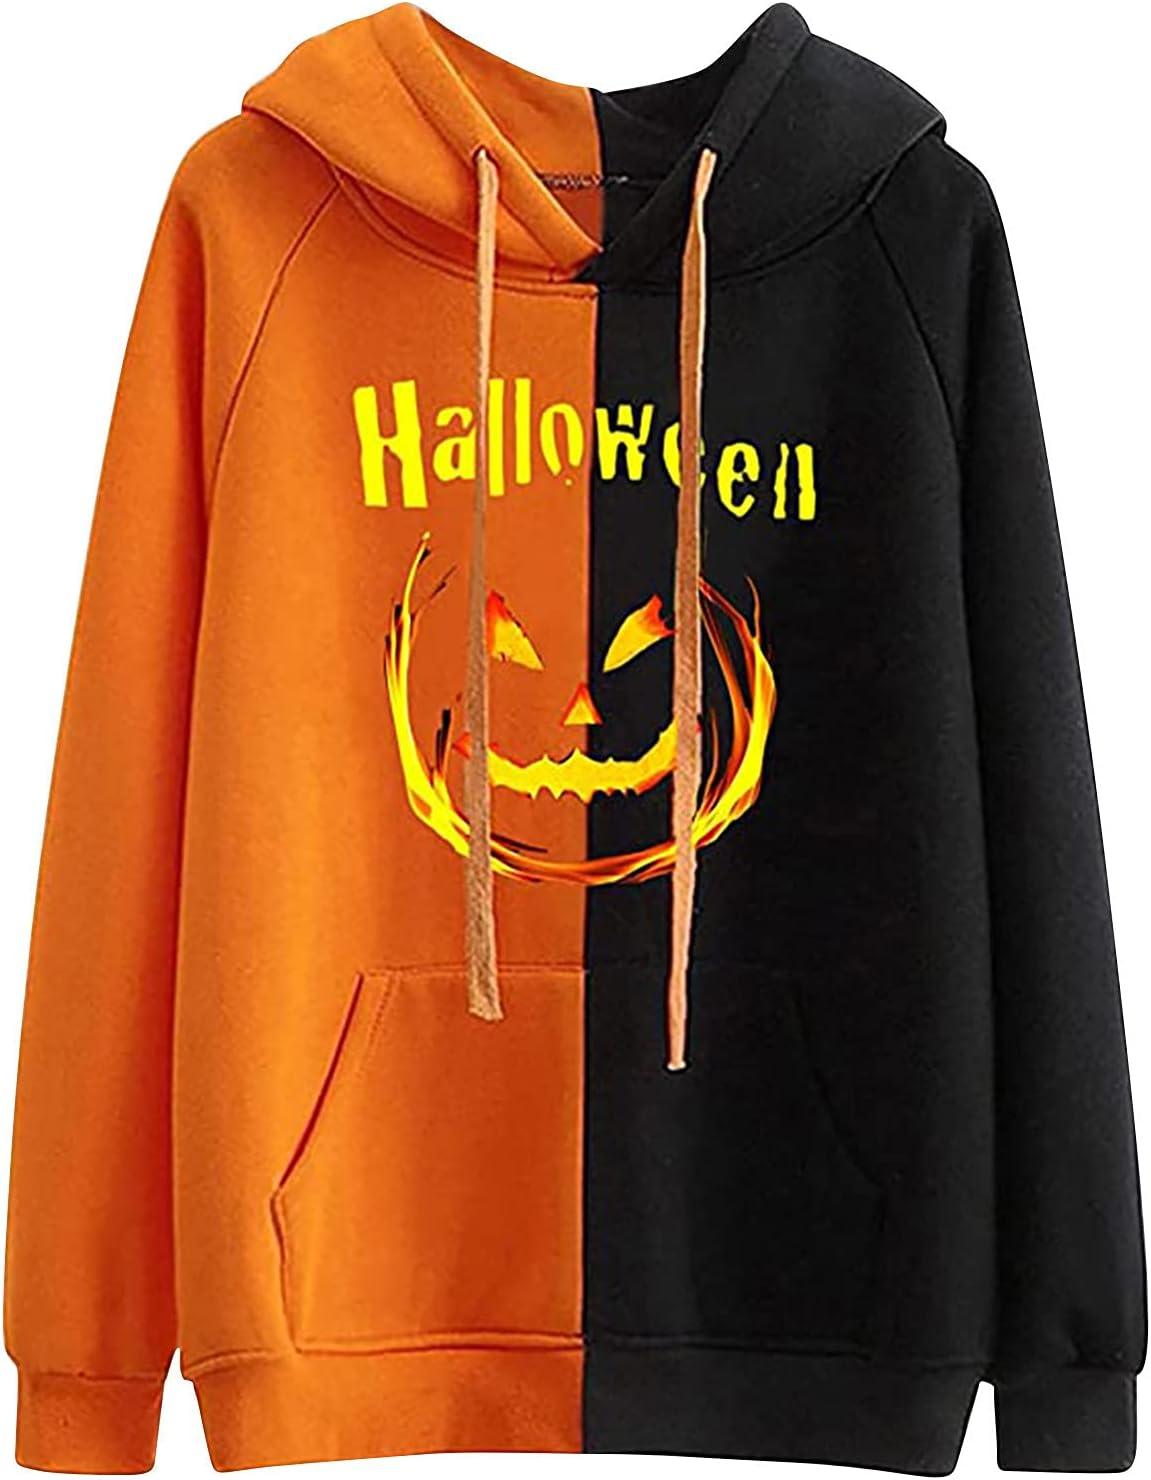 Halloween Shirts for Max 87% OFF Women Max 60% OFF Patchwork - Pumpkin Skull Hoodie Prin